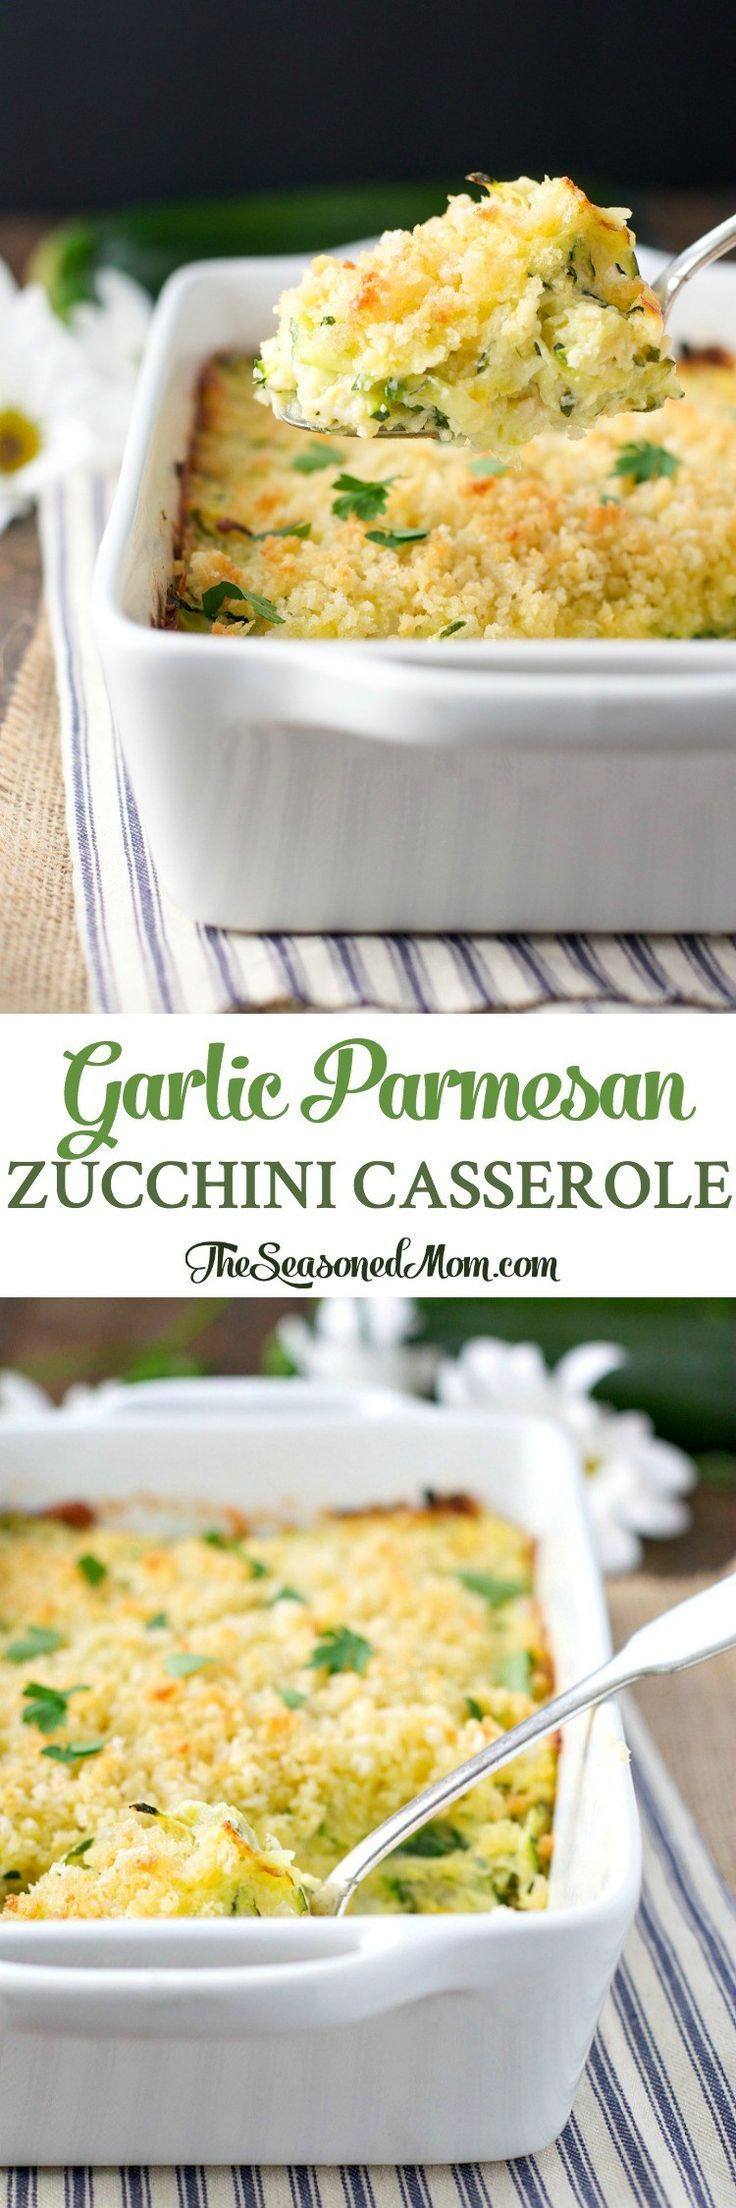 Garlic Parmesan Zucchini Casserole + Dinner with Barber Foods!